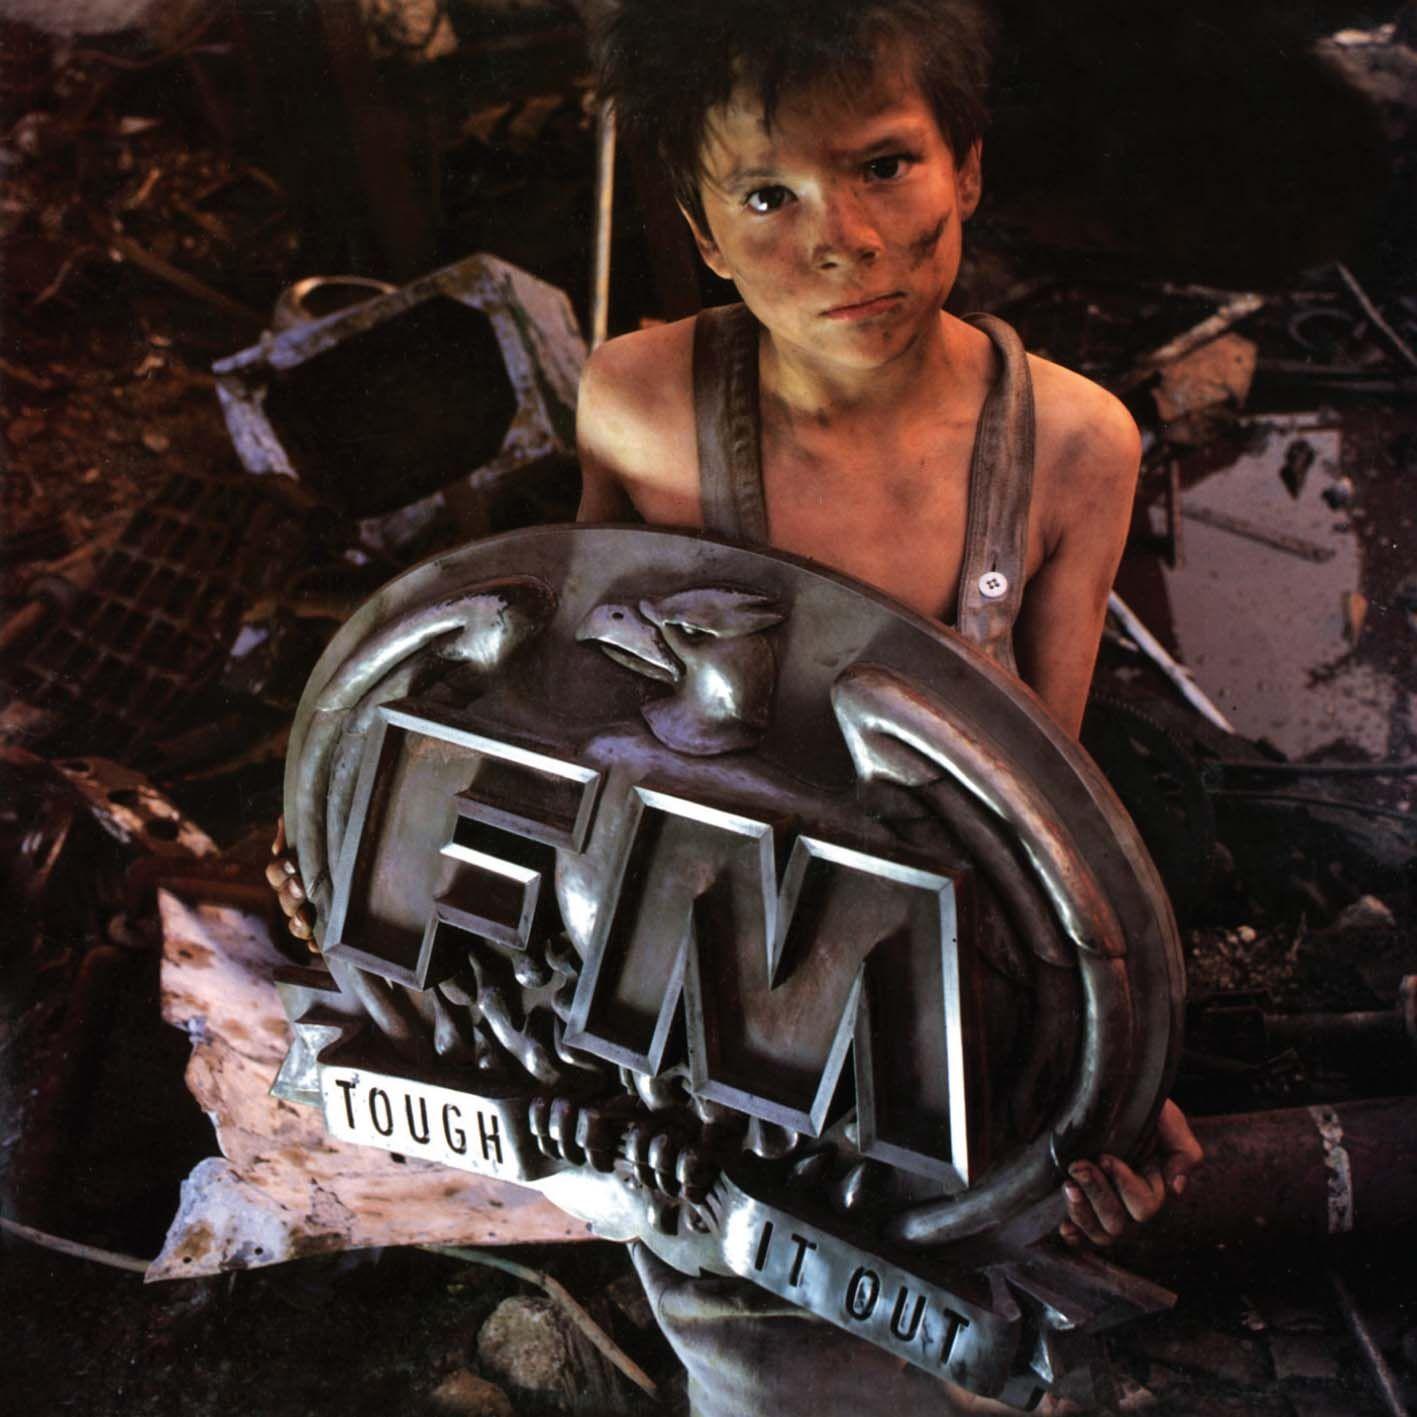 FM - Tough It Out 09/02/14